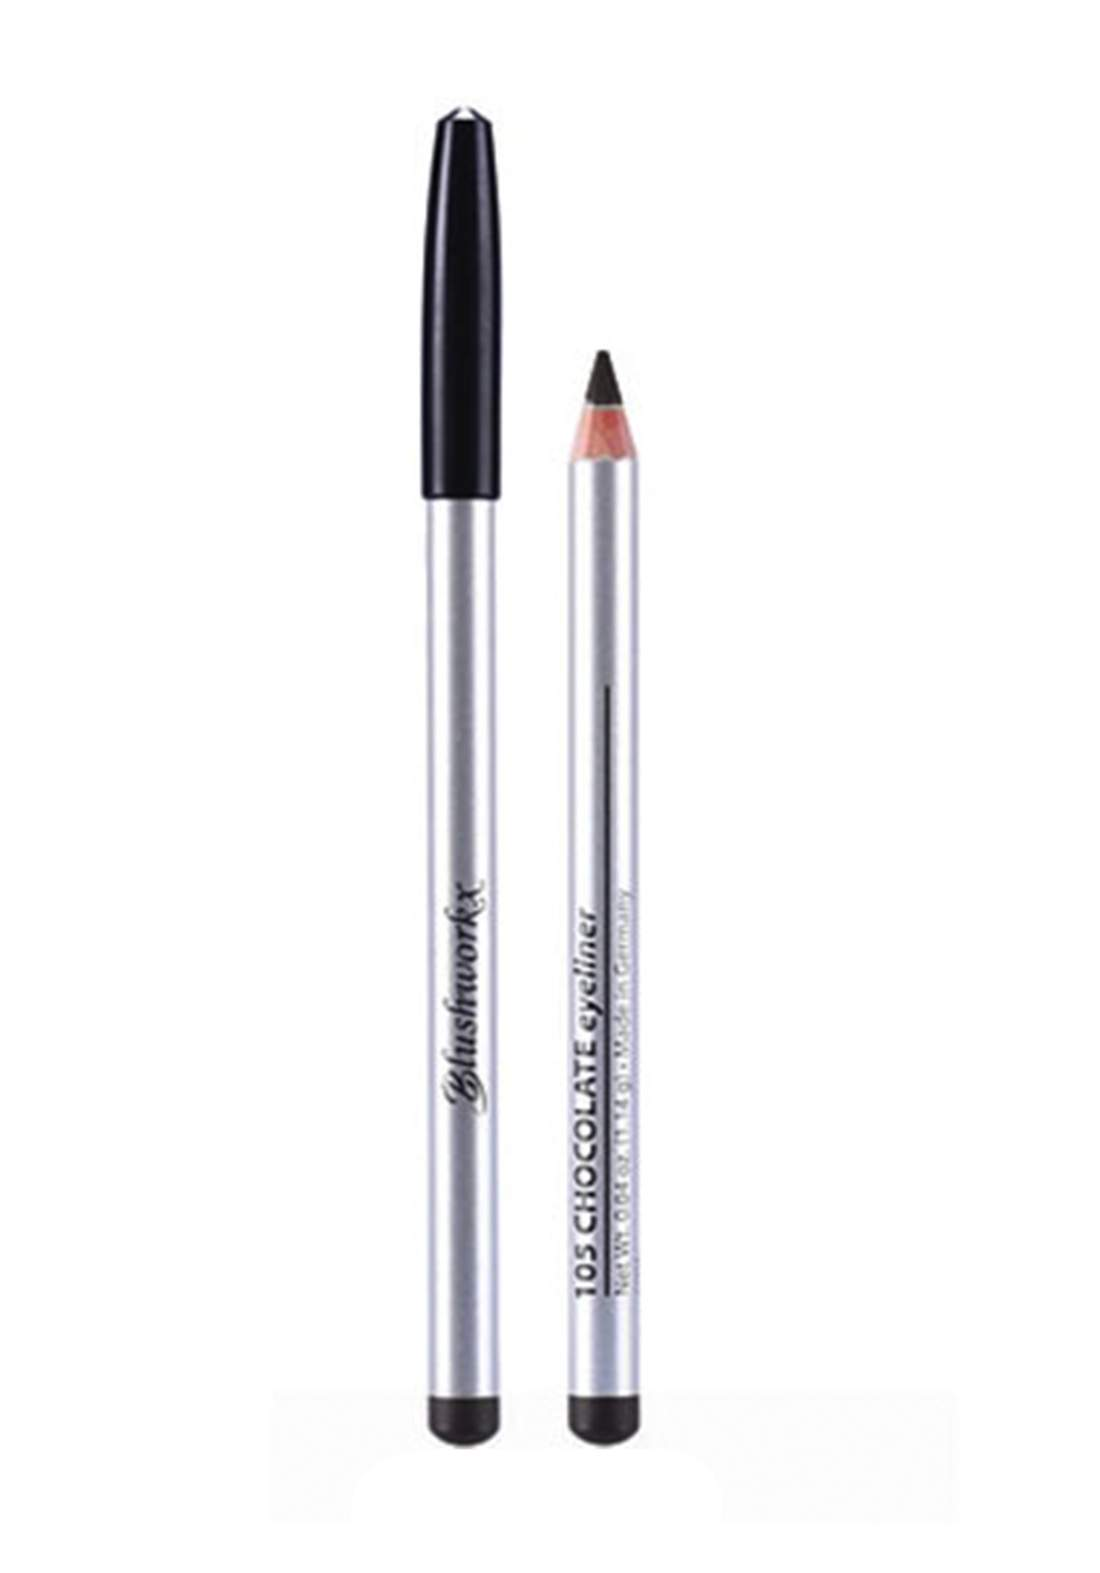 Blushworkx Hollywood Eyeliner No.104 Black 1.14g محدد العيون